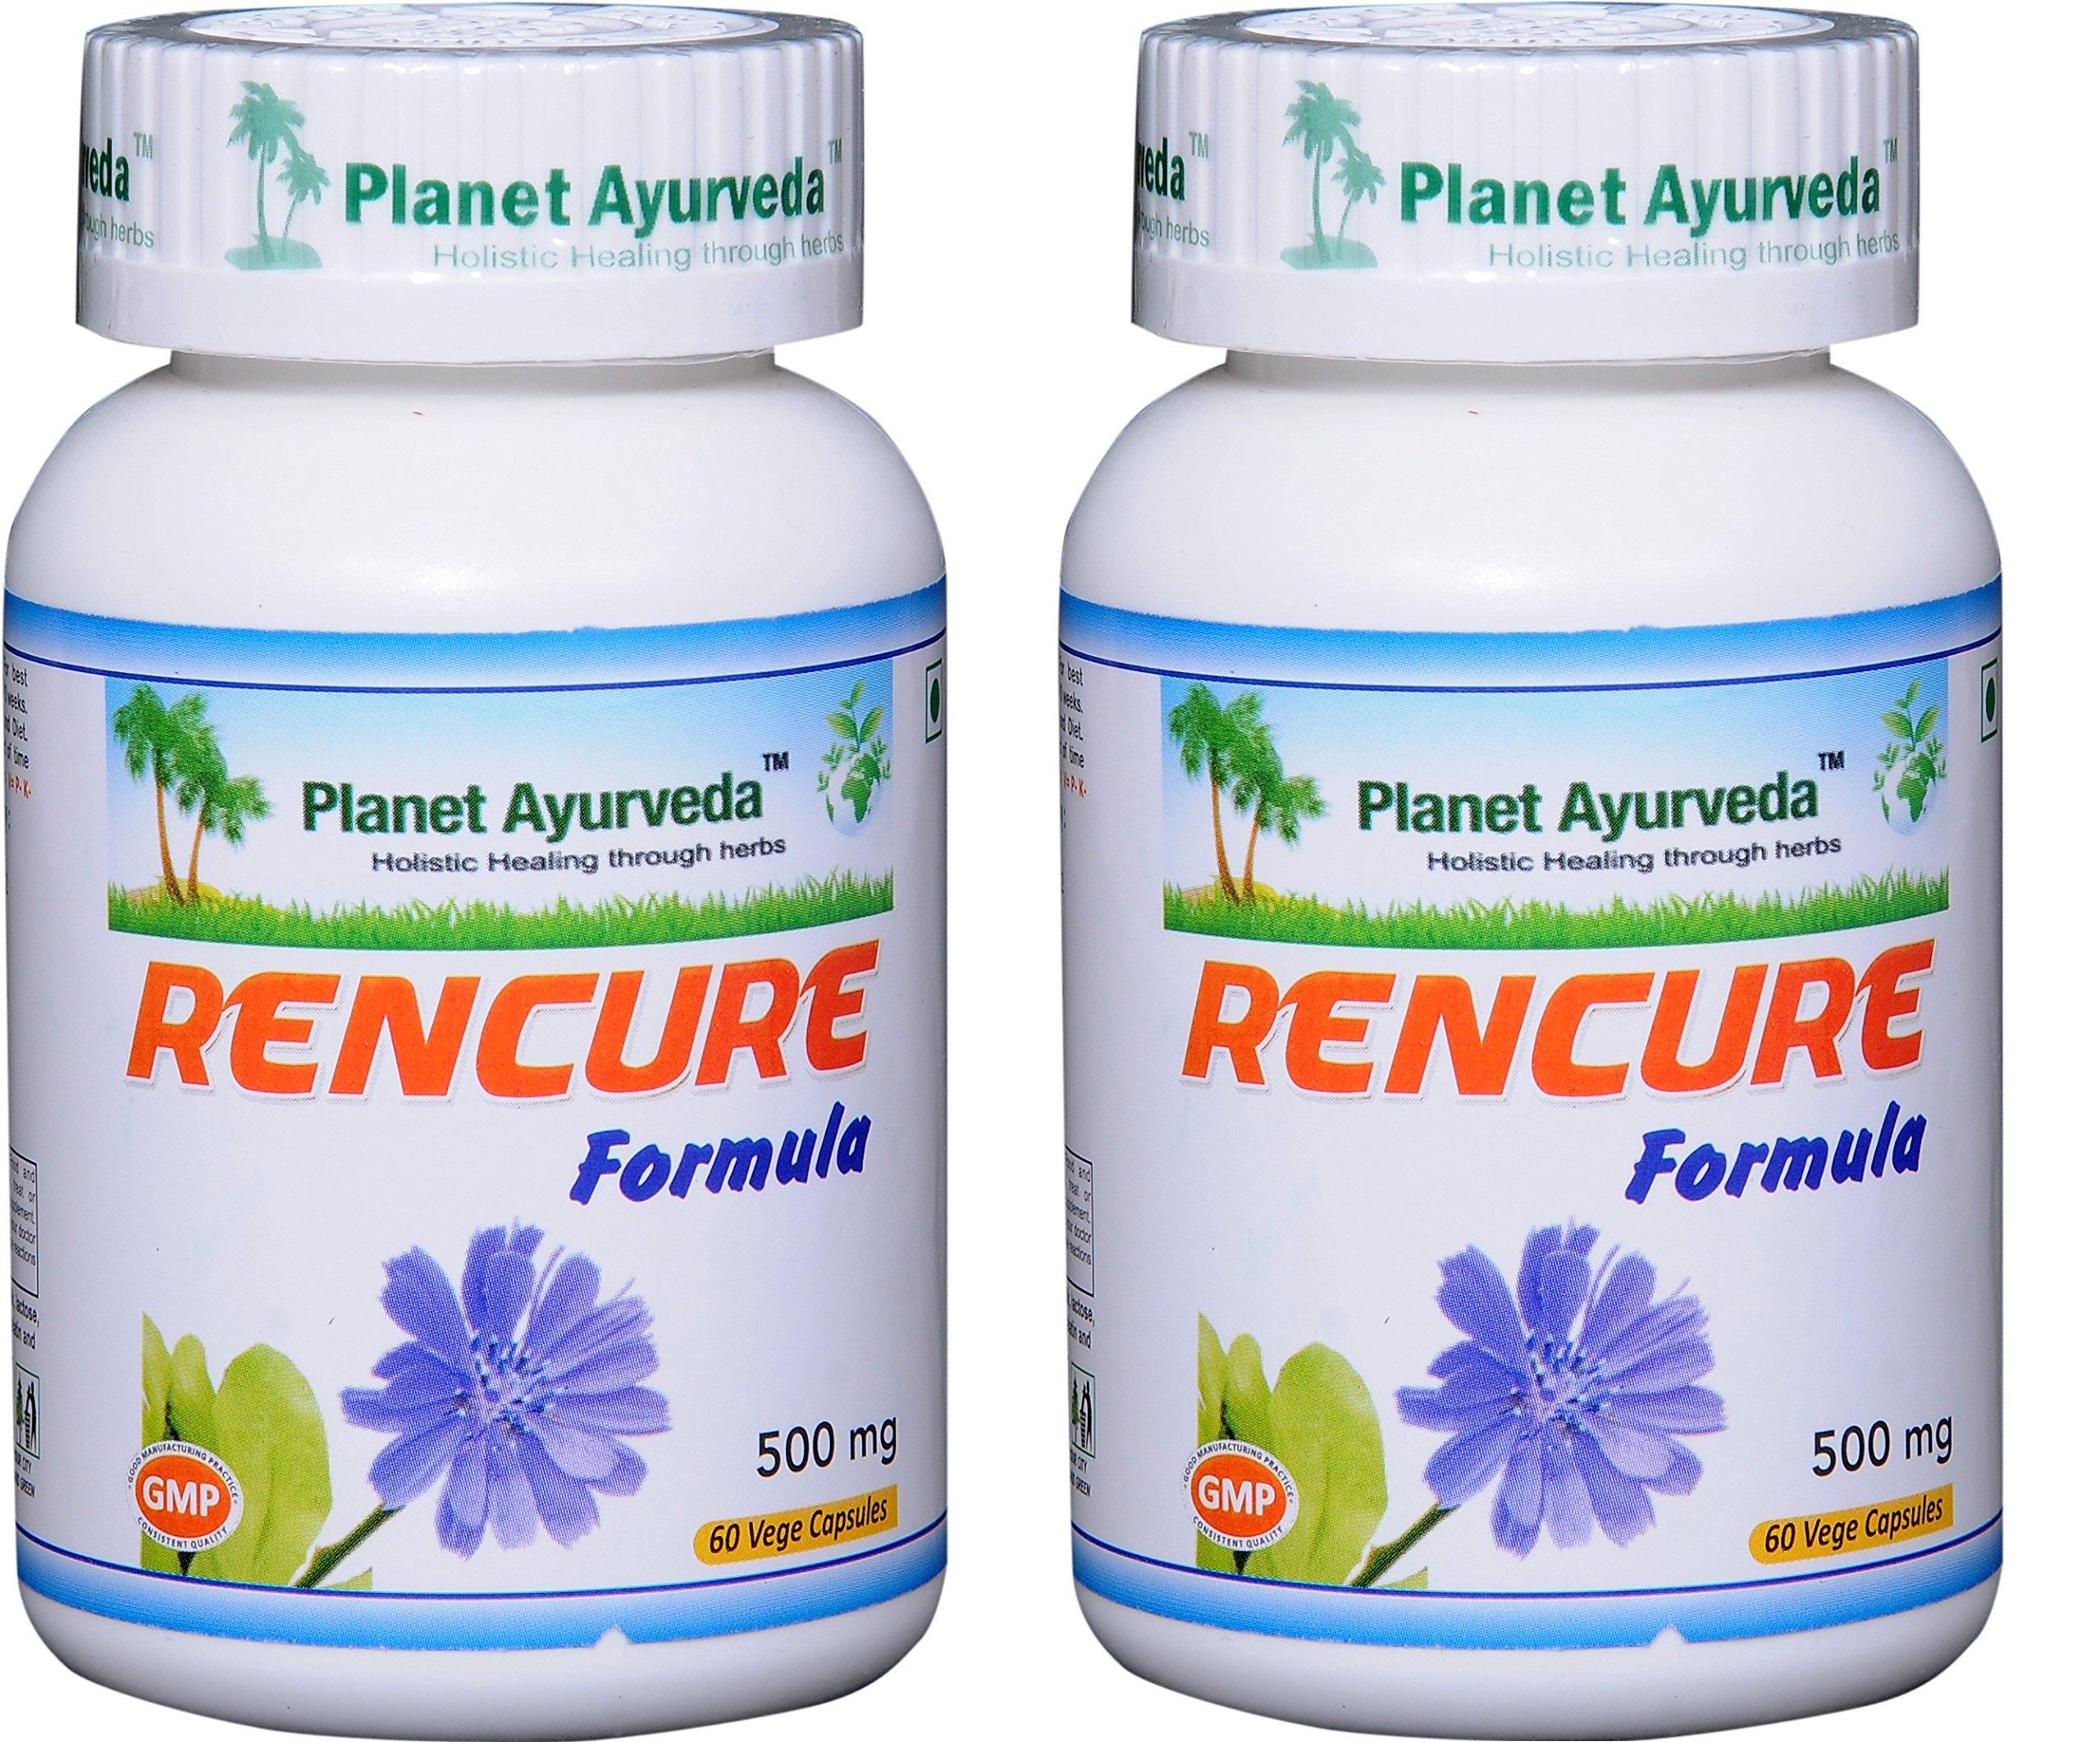 Planet Ayurveda Rencure Formula, 500mg Veg Capsules - 2 Bottles